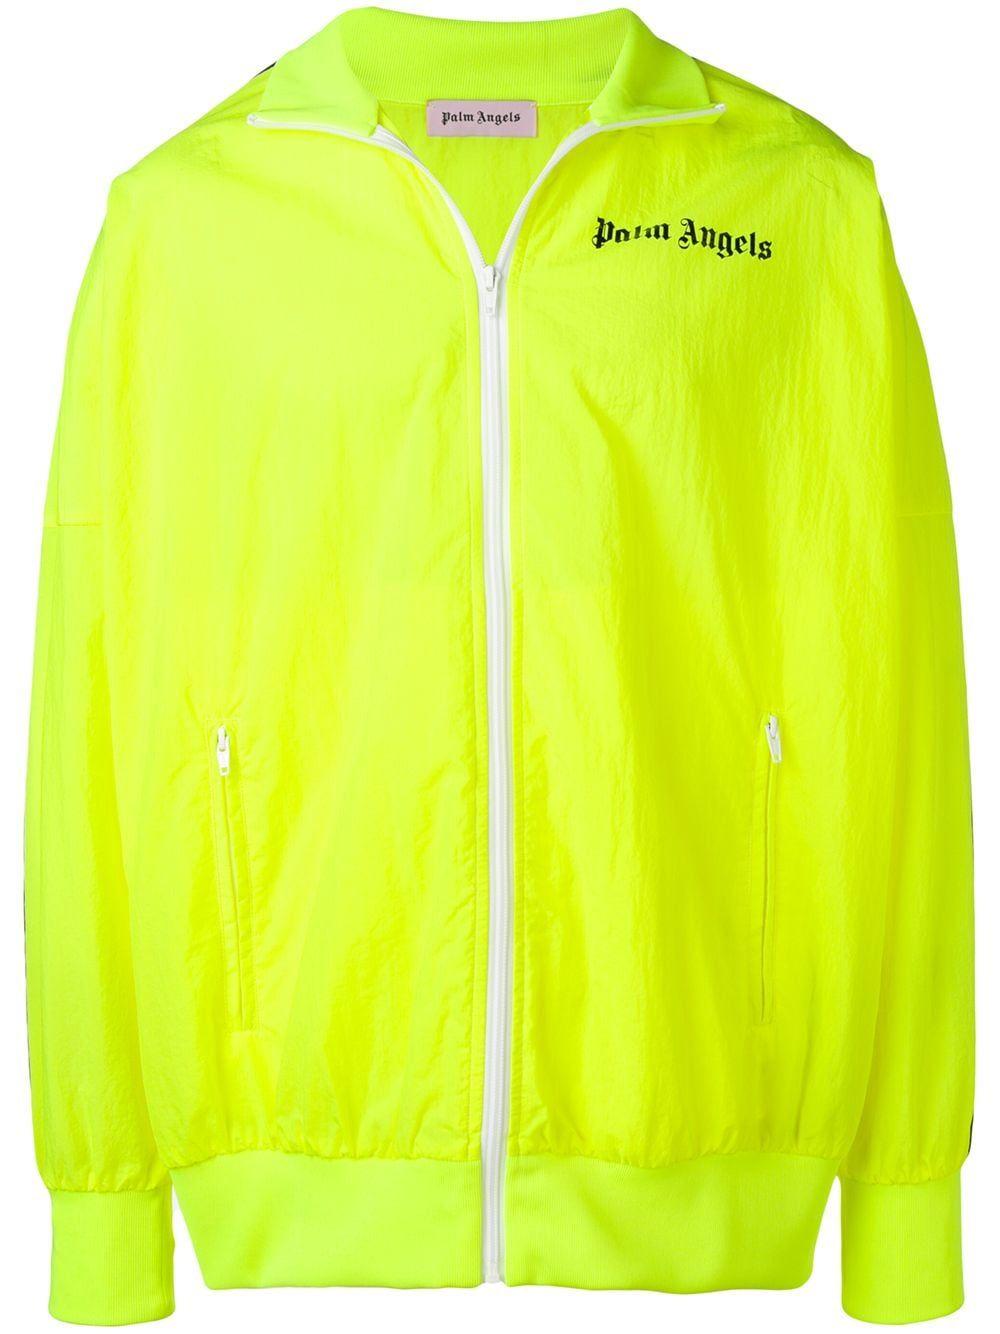 Palm Angels Klassische Trainingsjacke Gelb Palm Angels Jackets Track Jackets [ 1334 x 1000 Pixel ]